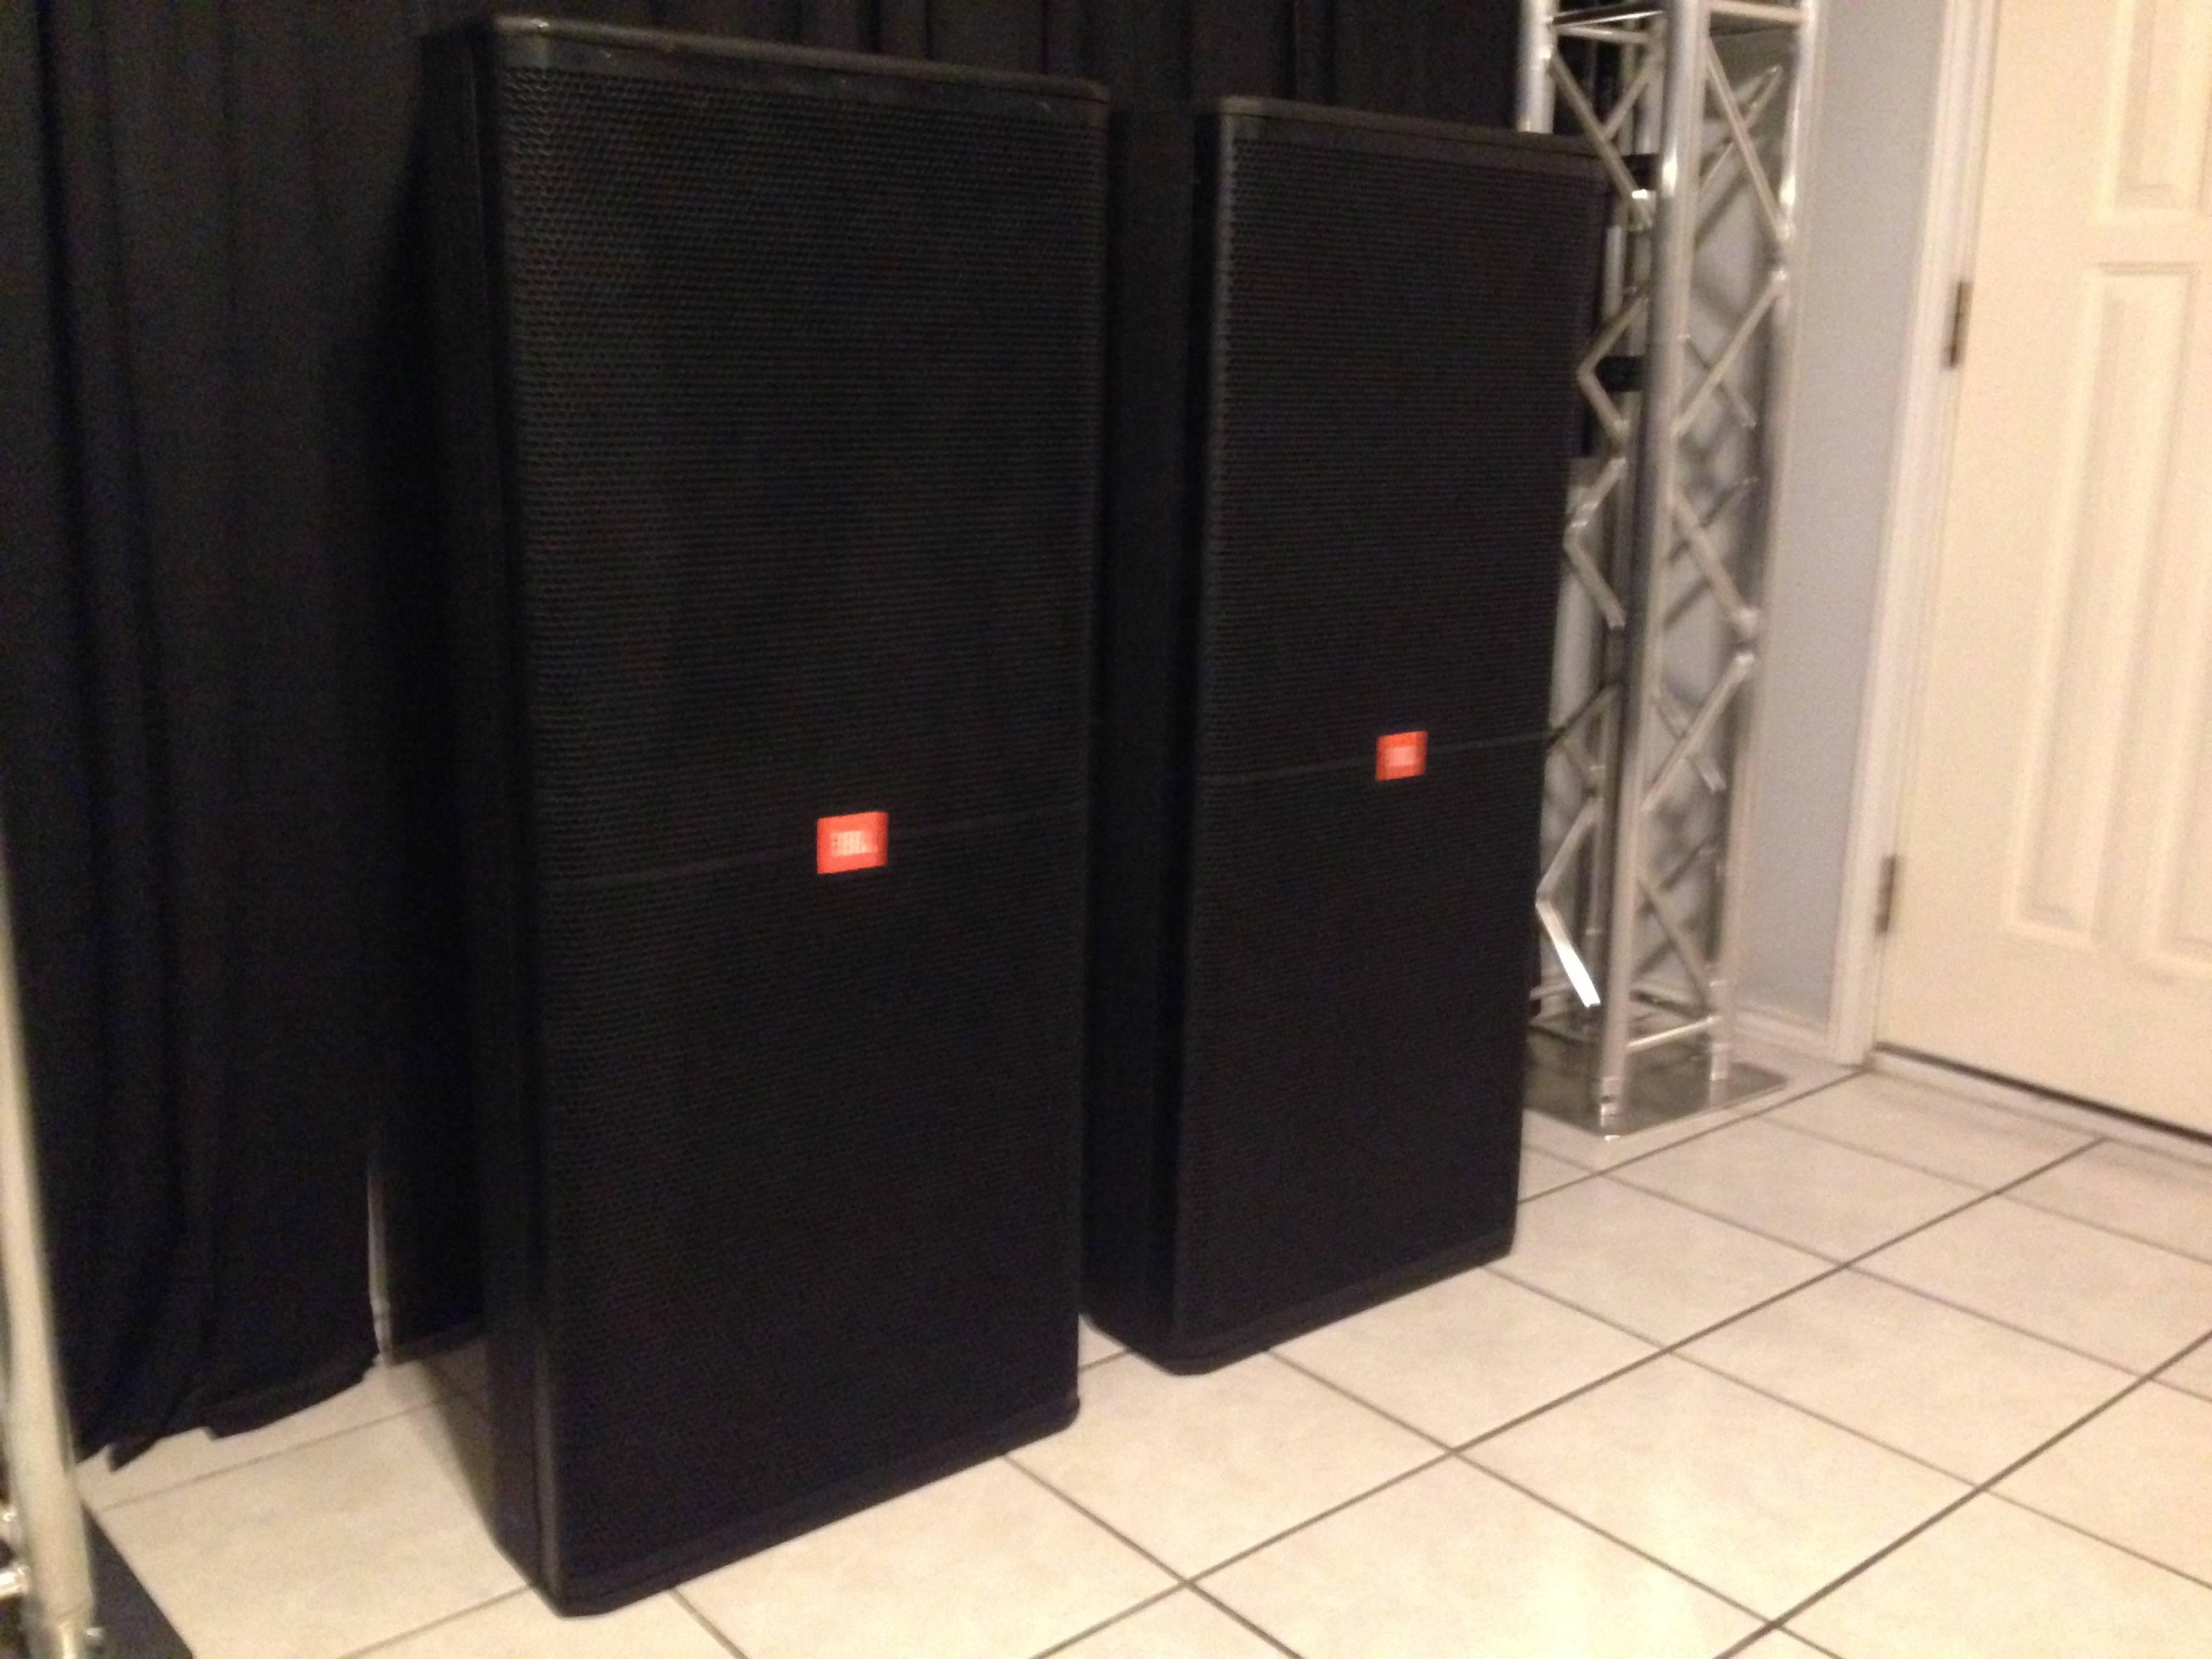 JBL SRX 725's 4 available as well as SRX 728's